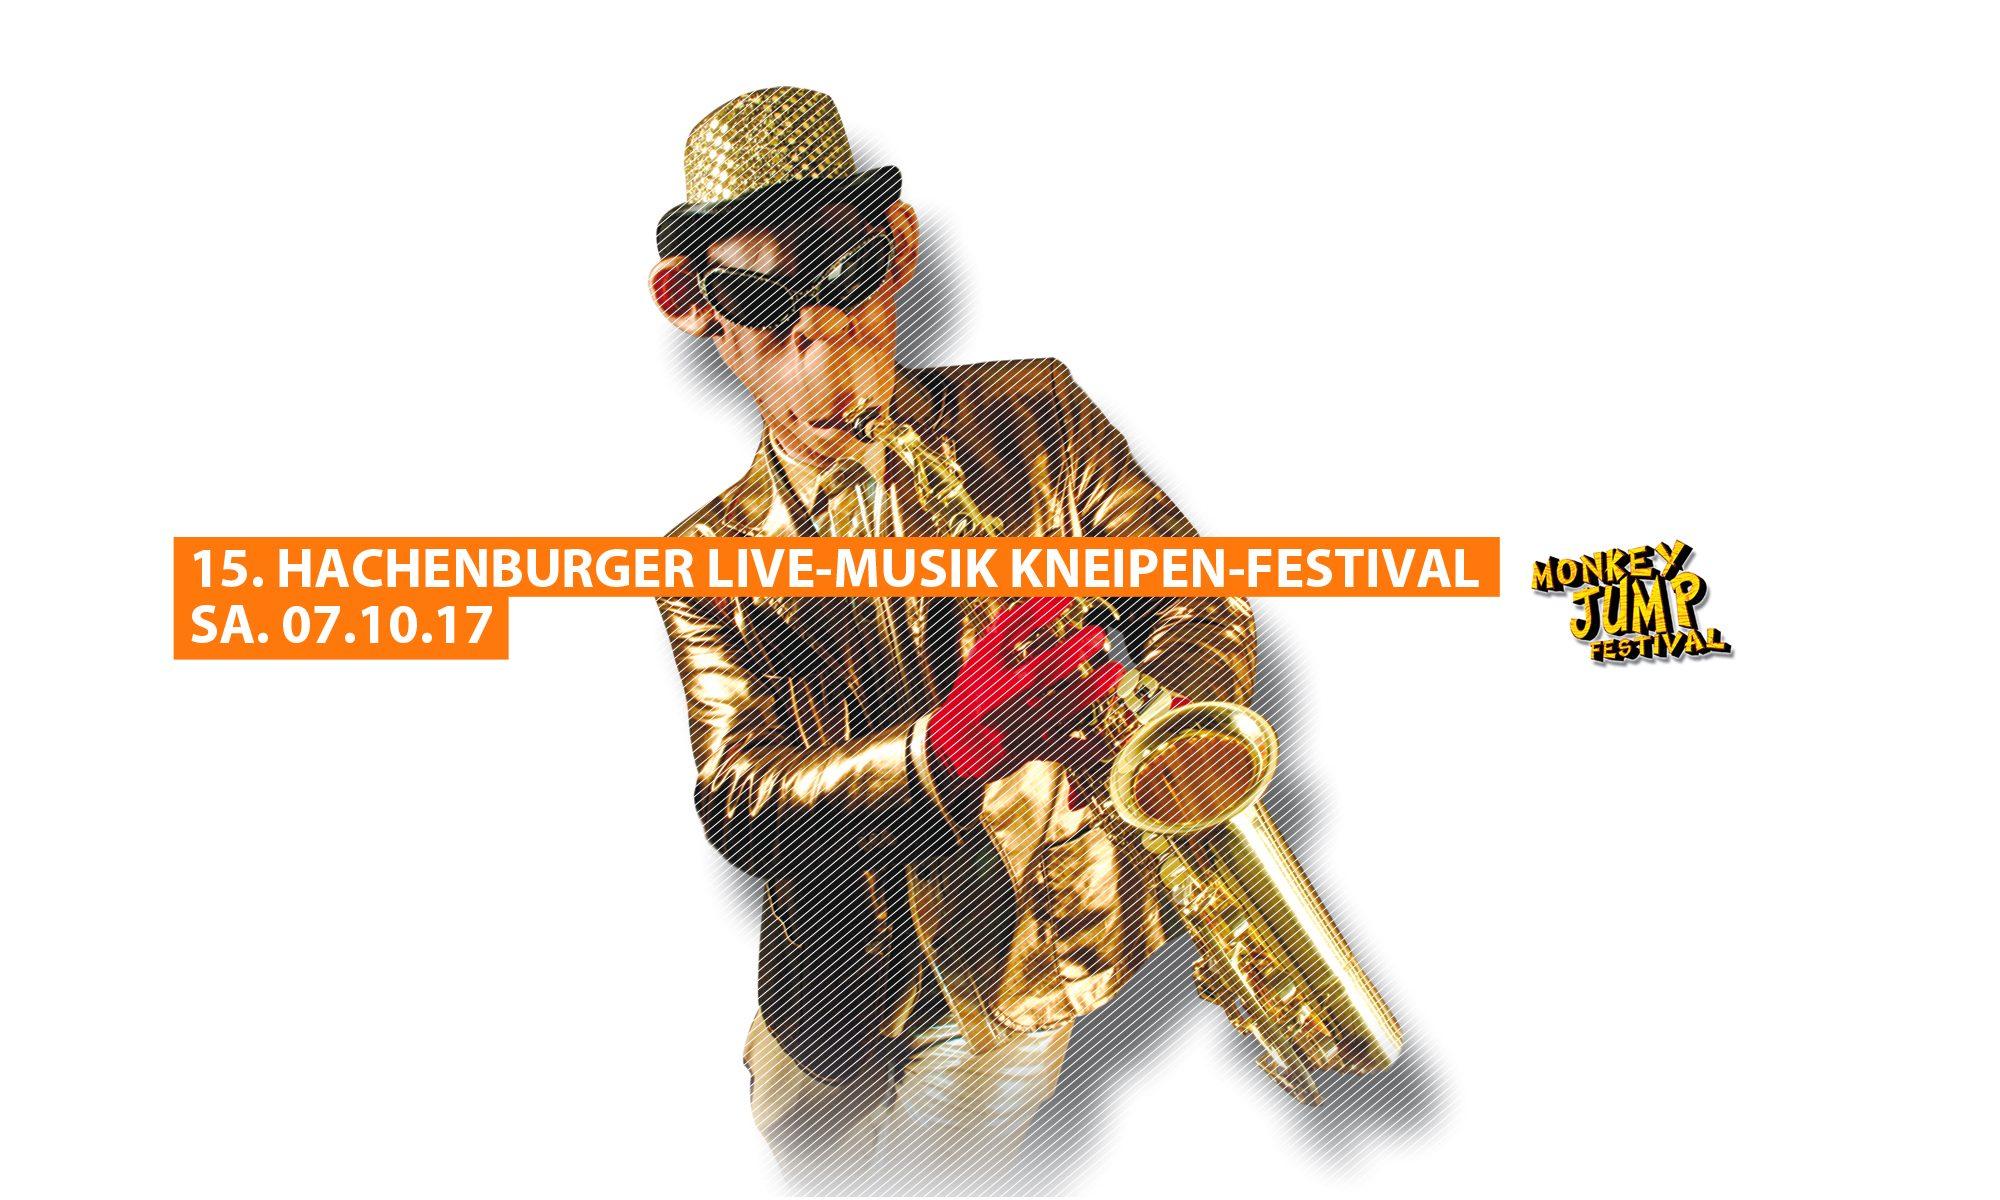 15. Monkey Jump Festival Hachenburg